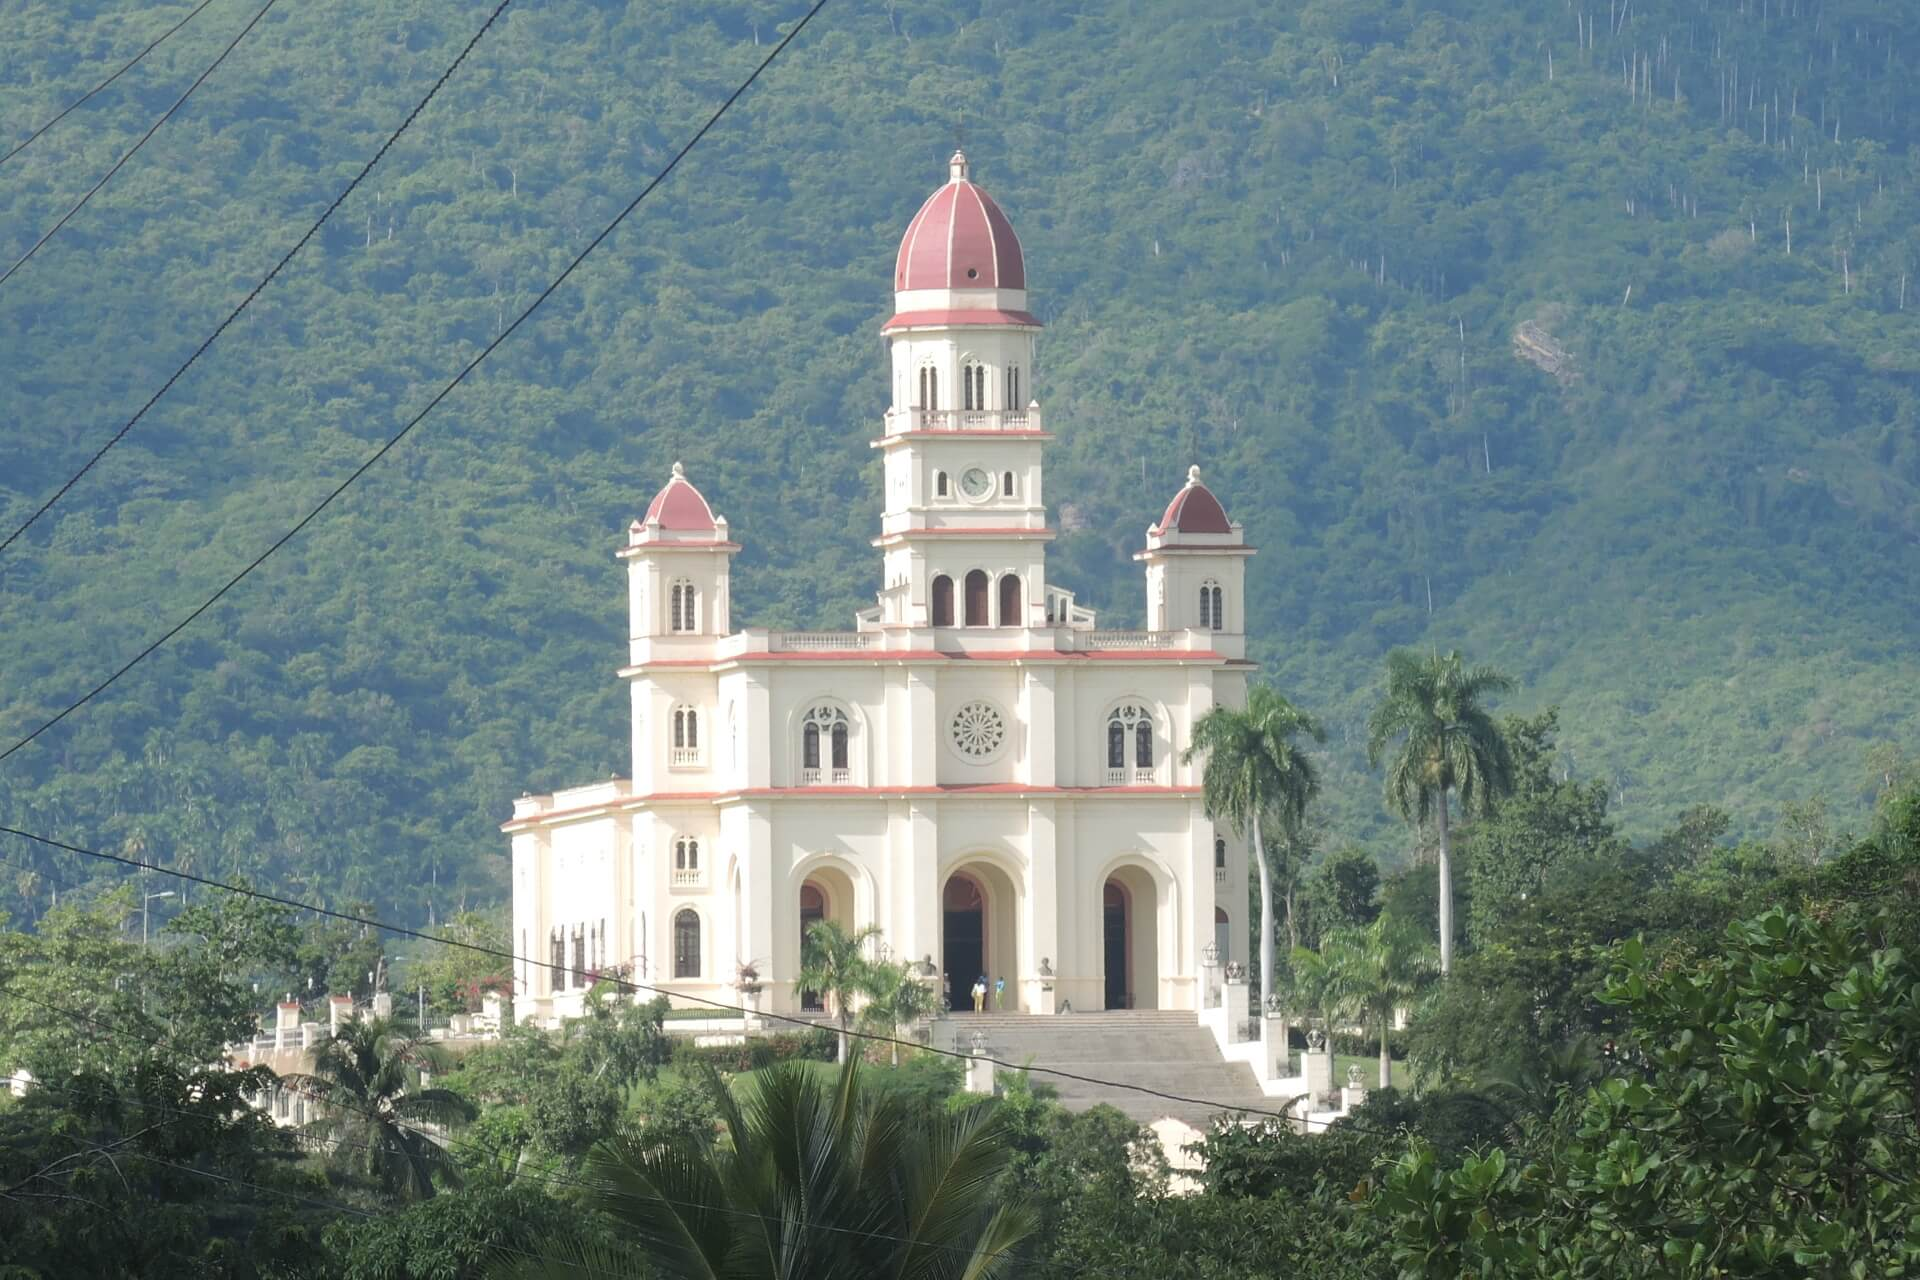 Kuba Sehenswürdigkeiten - Wallfahrtskirche El Cobre Santiago de Cuba